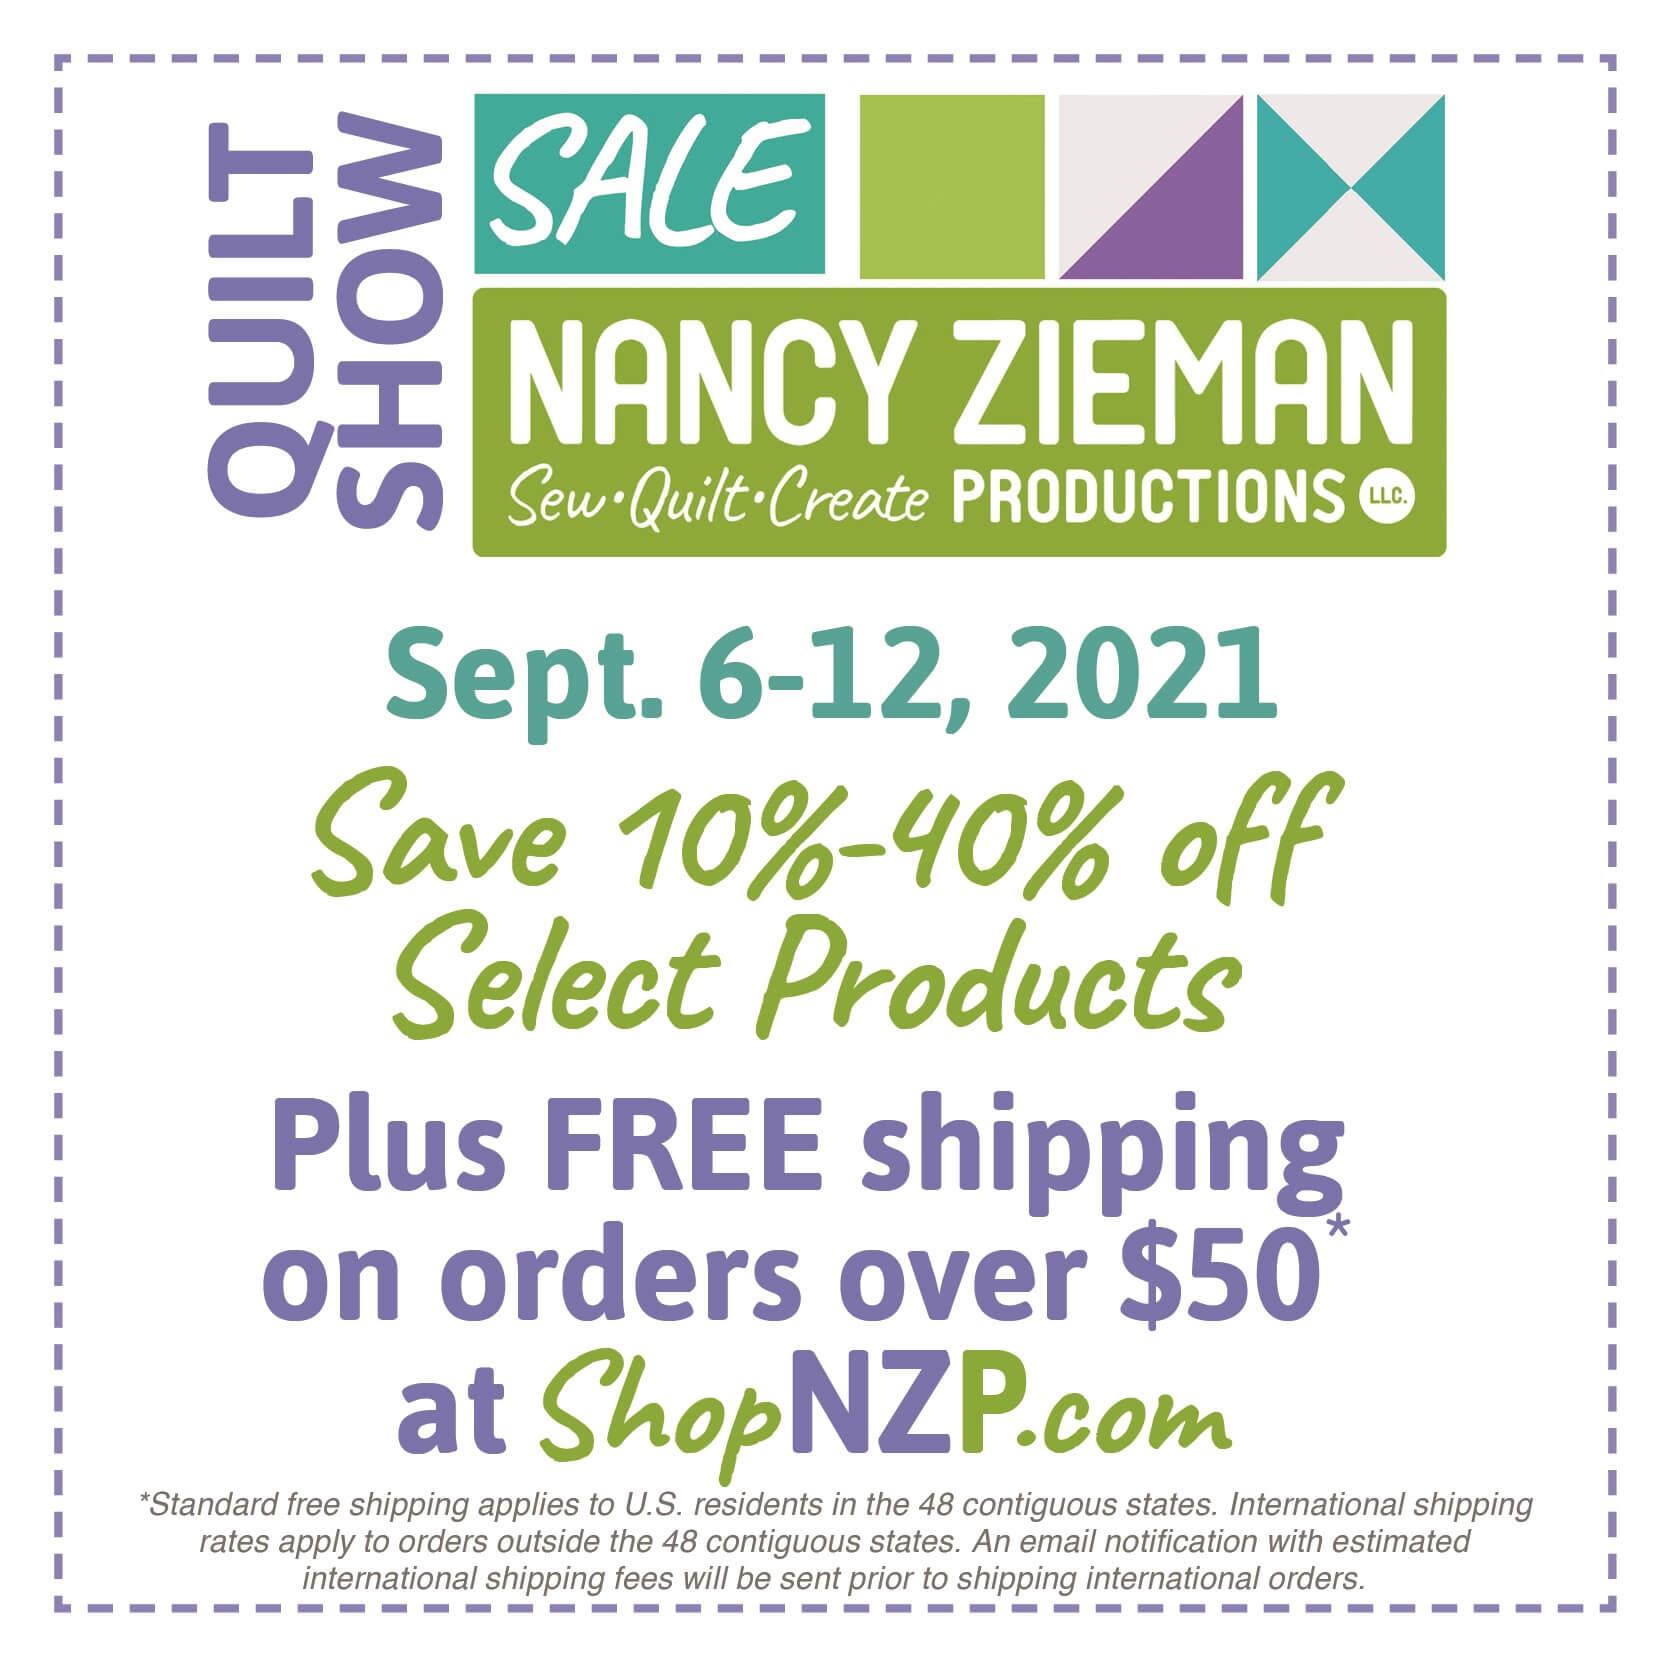 Quilt Show Sale at Nancy Zieman Productions at ShopNZP.com through September 12, 2021